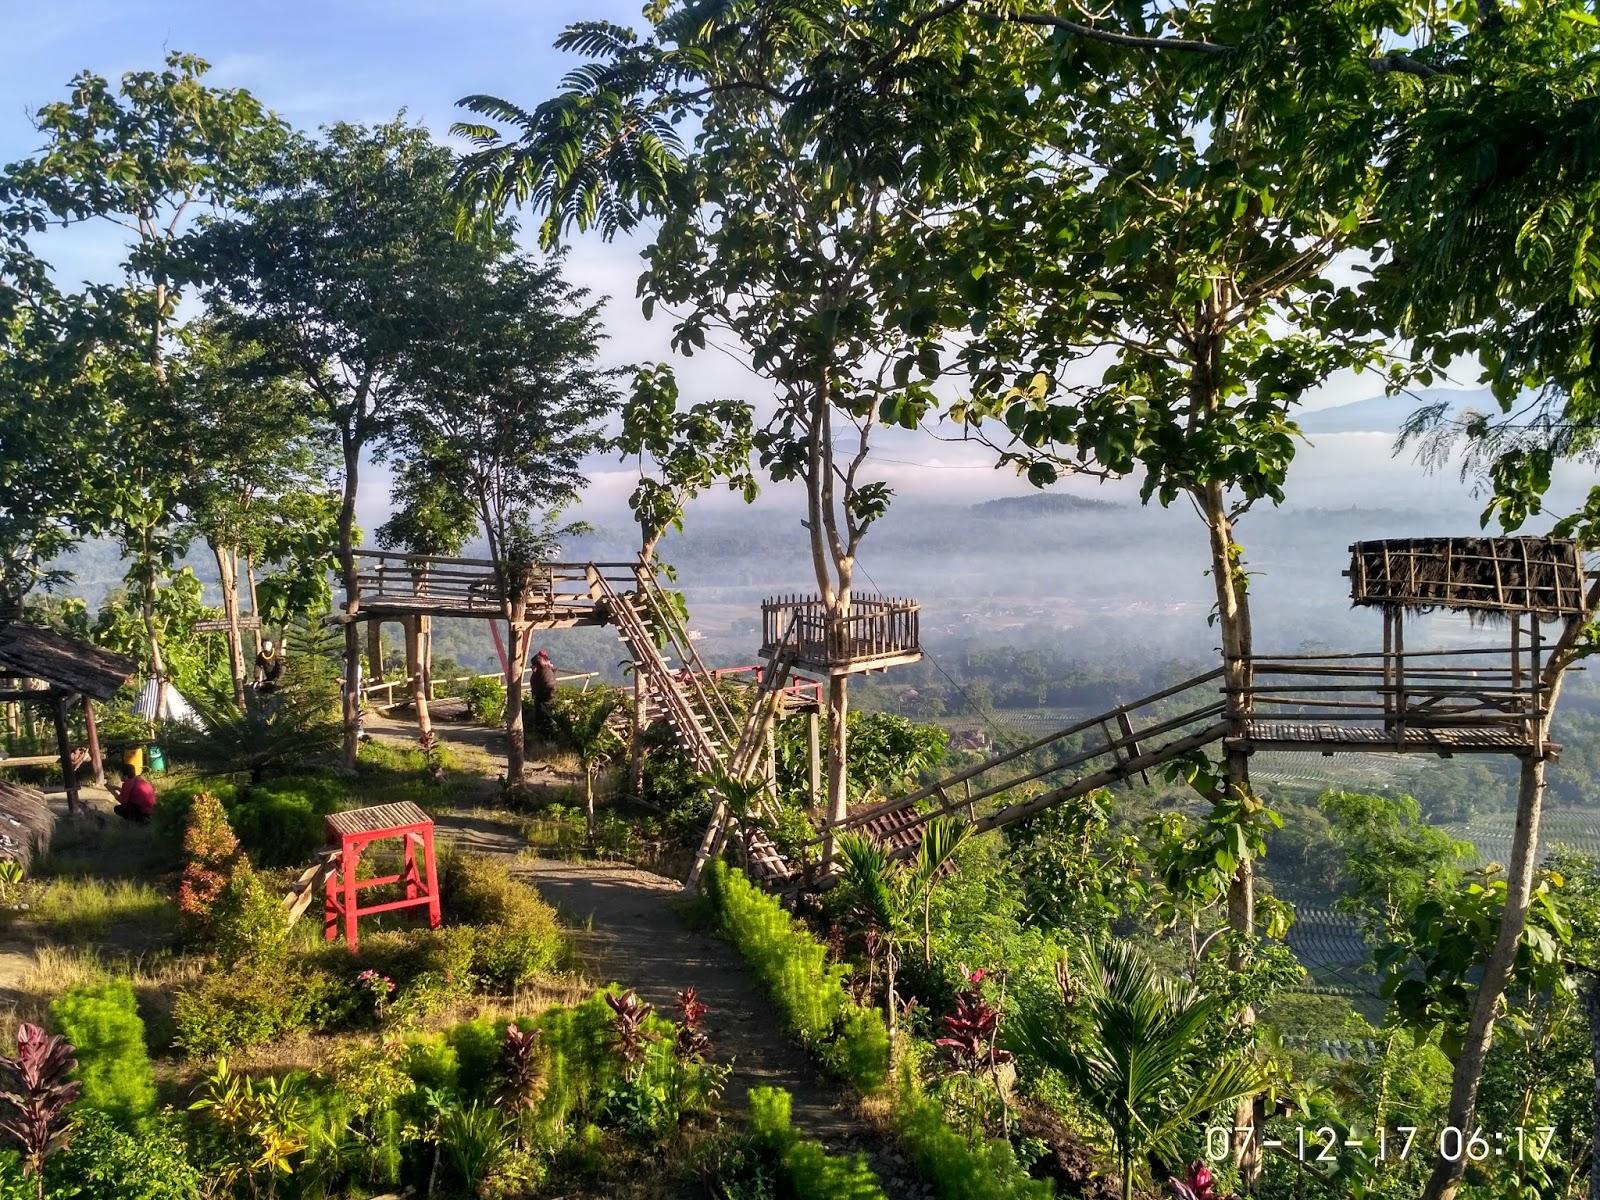 Mengejar Sunrise Punthuk Gupakan Traveling Diary Foto Lokasi Wisata Diambil